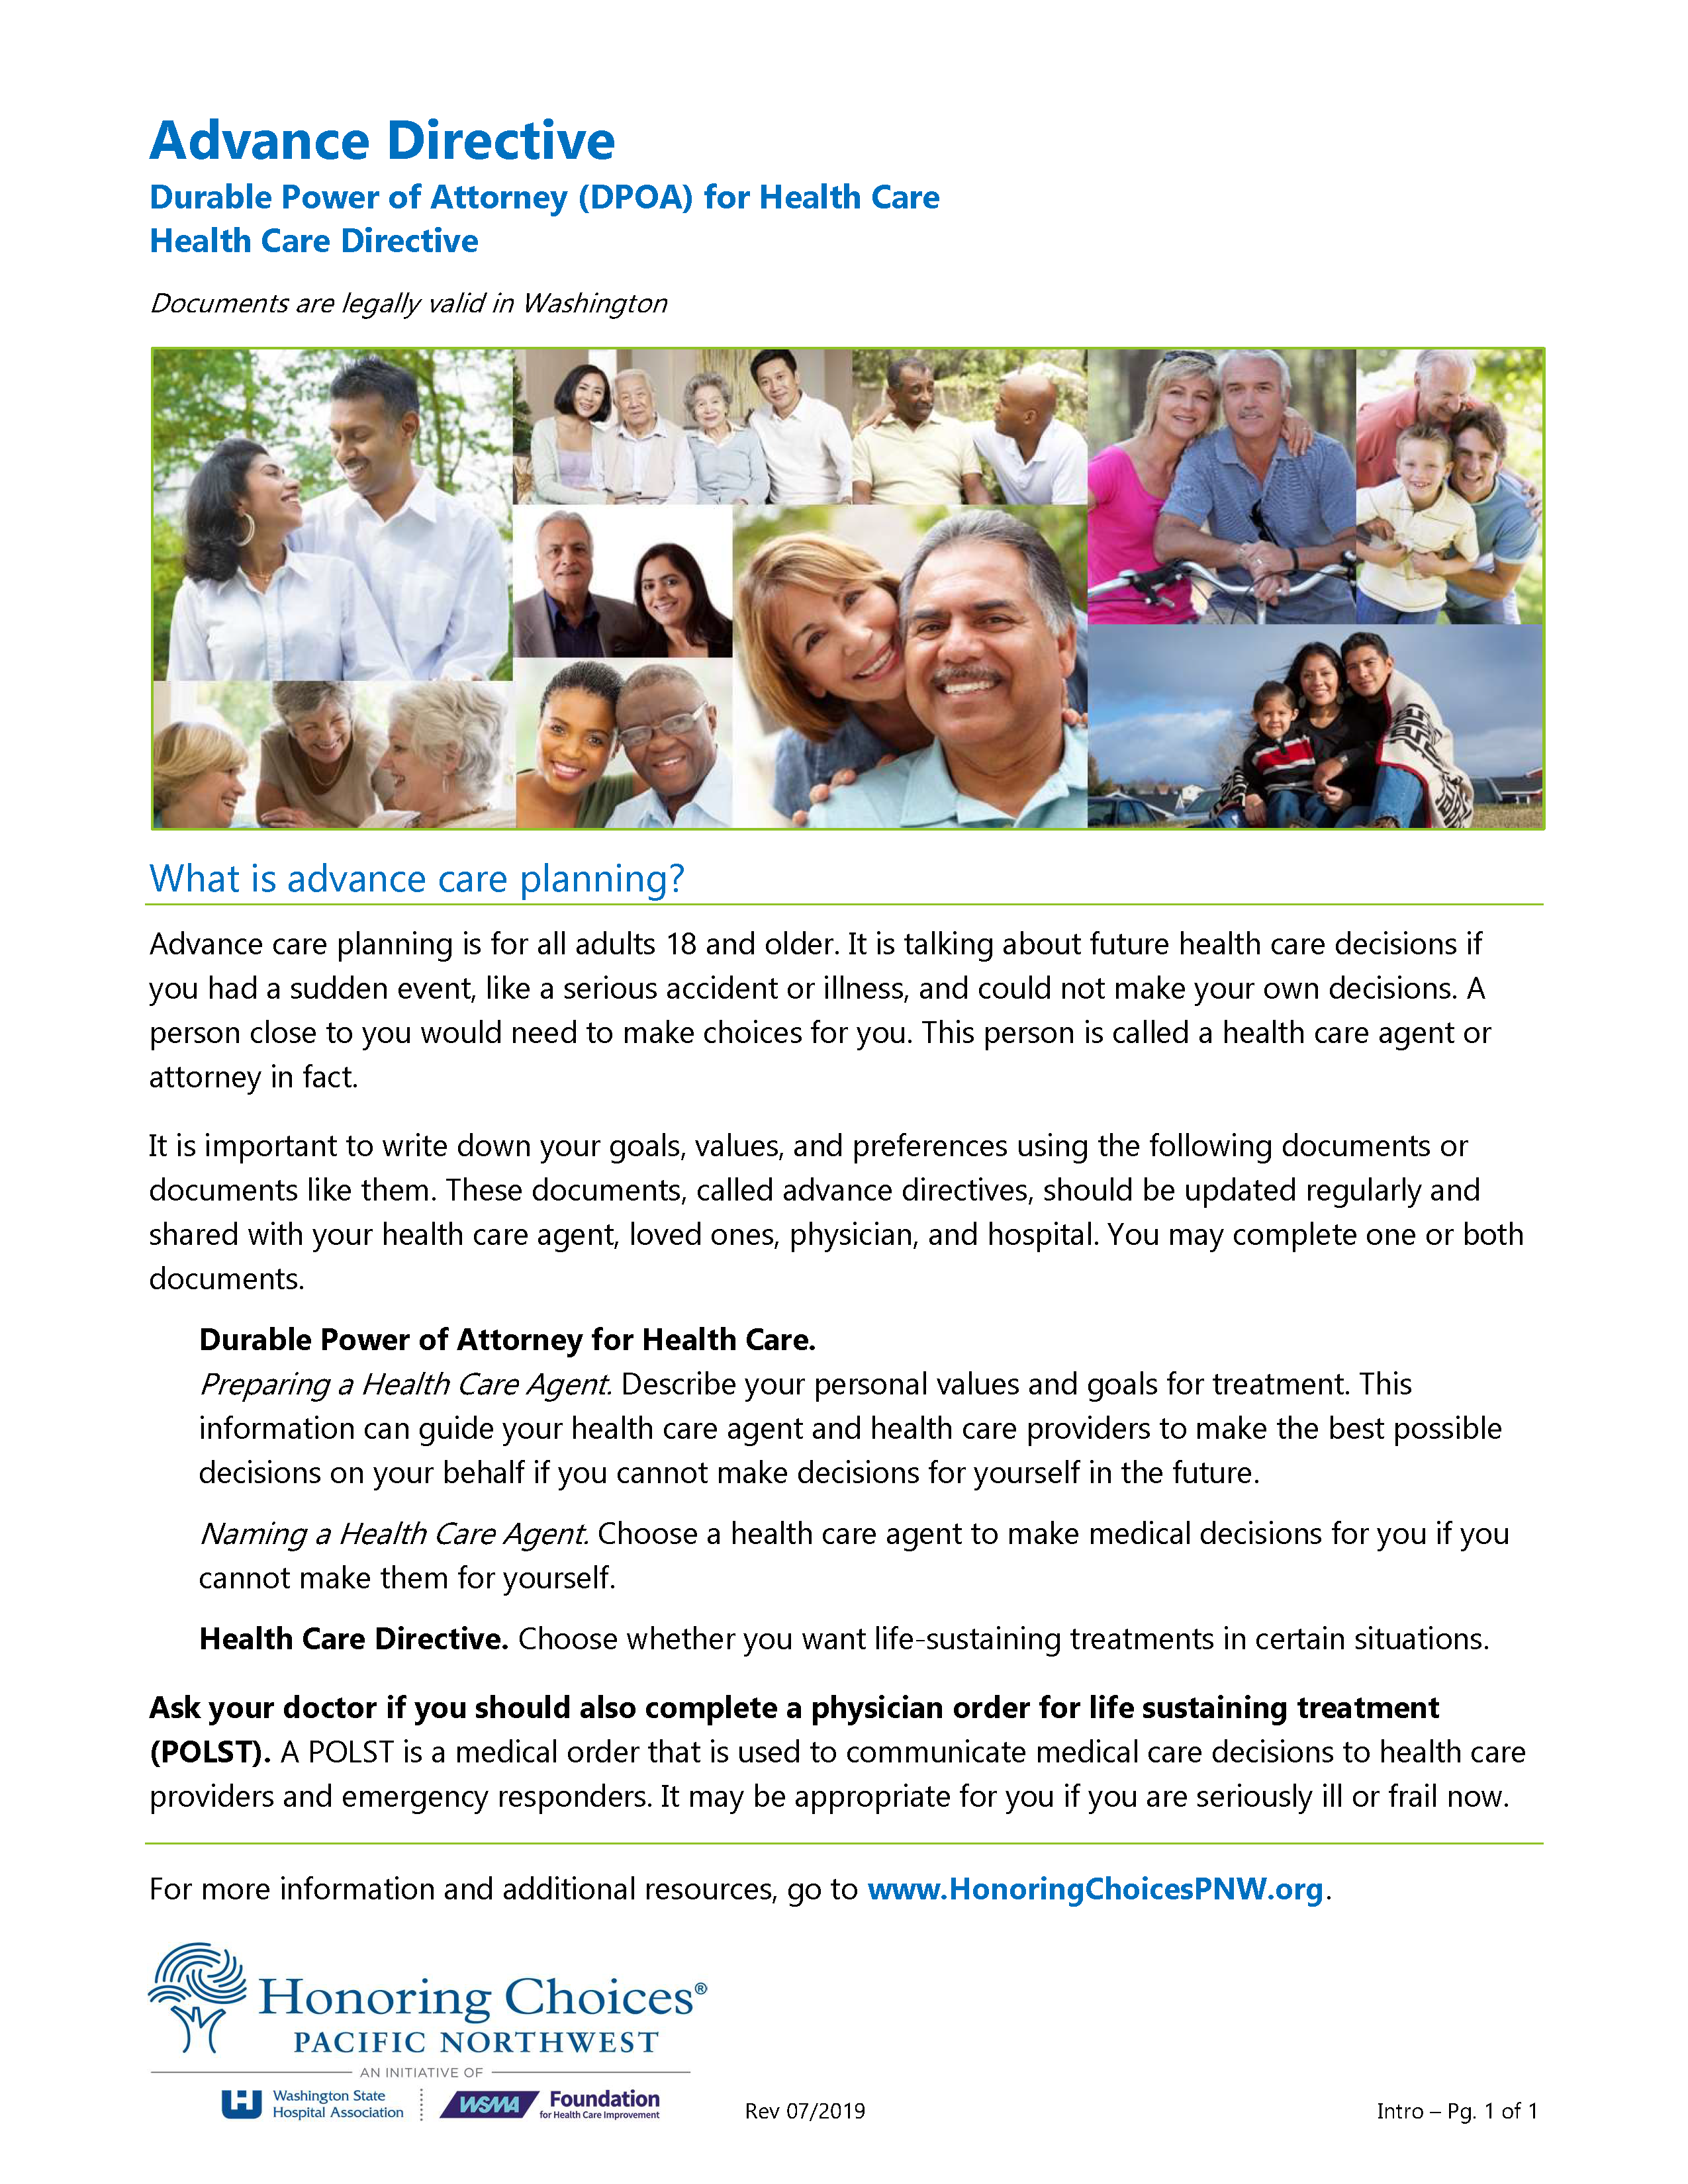 Washington Advance Directive For Health Care